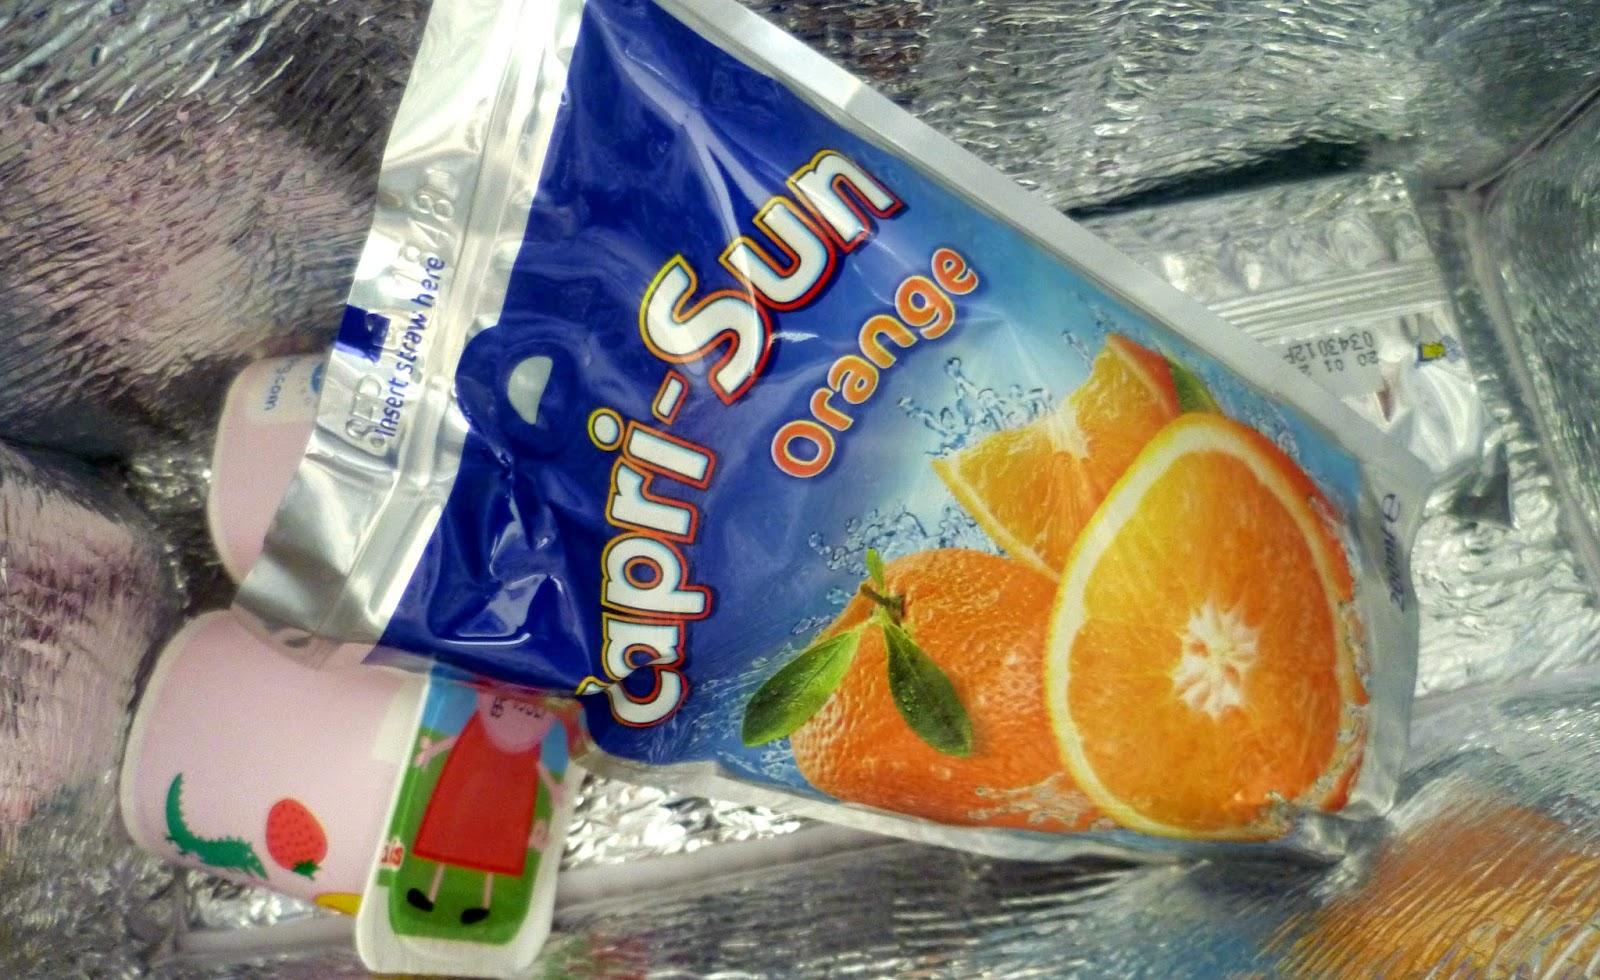 capri sun lunchbox #shop #cbias